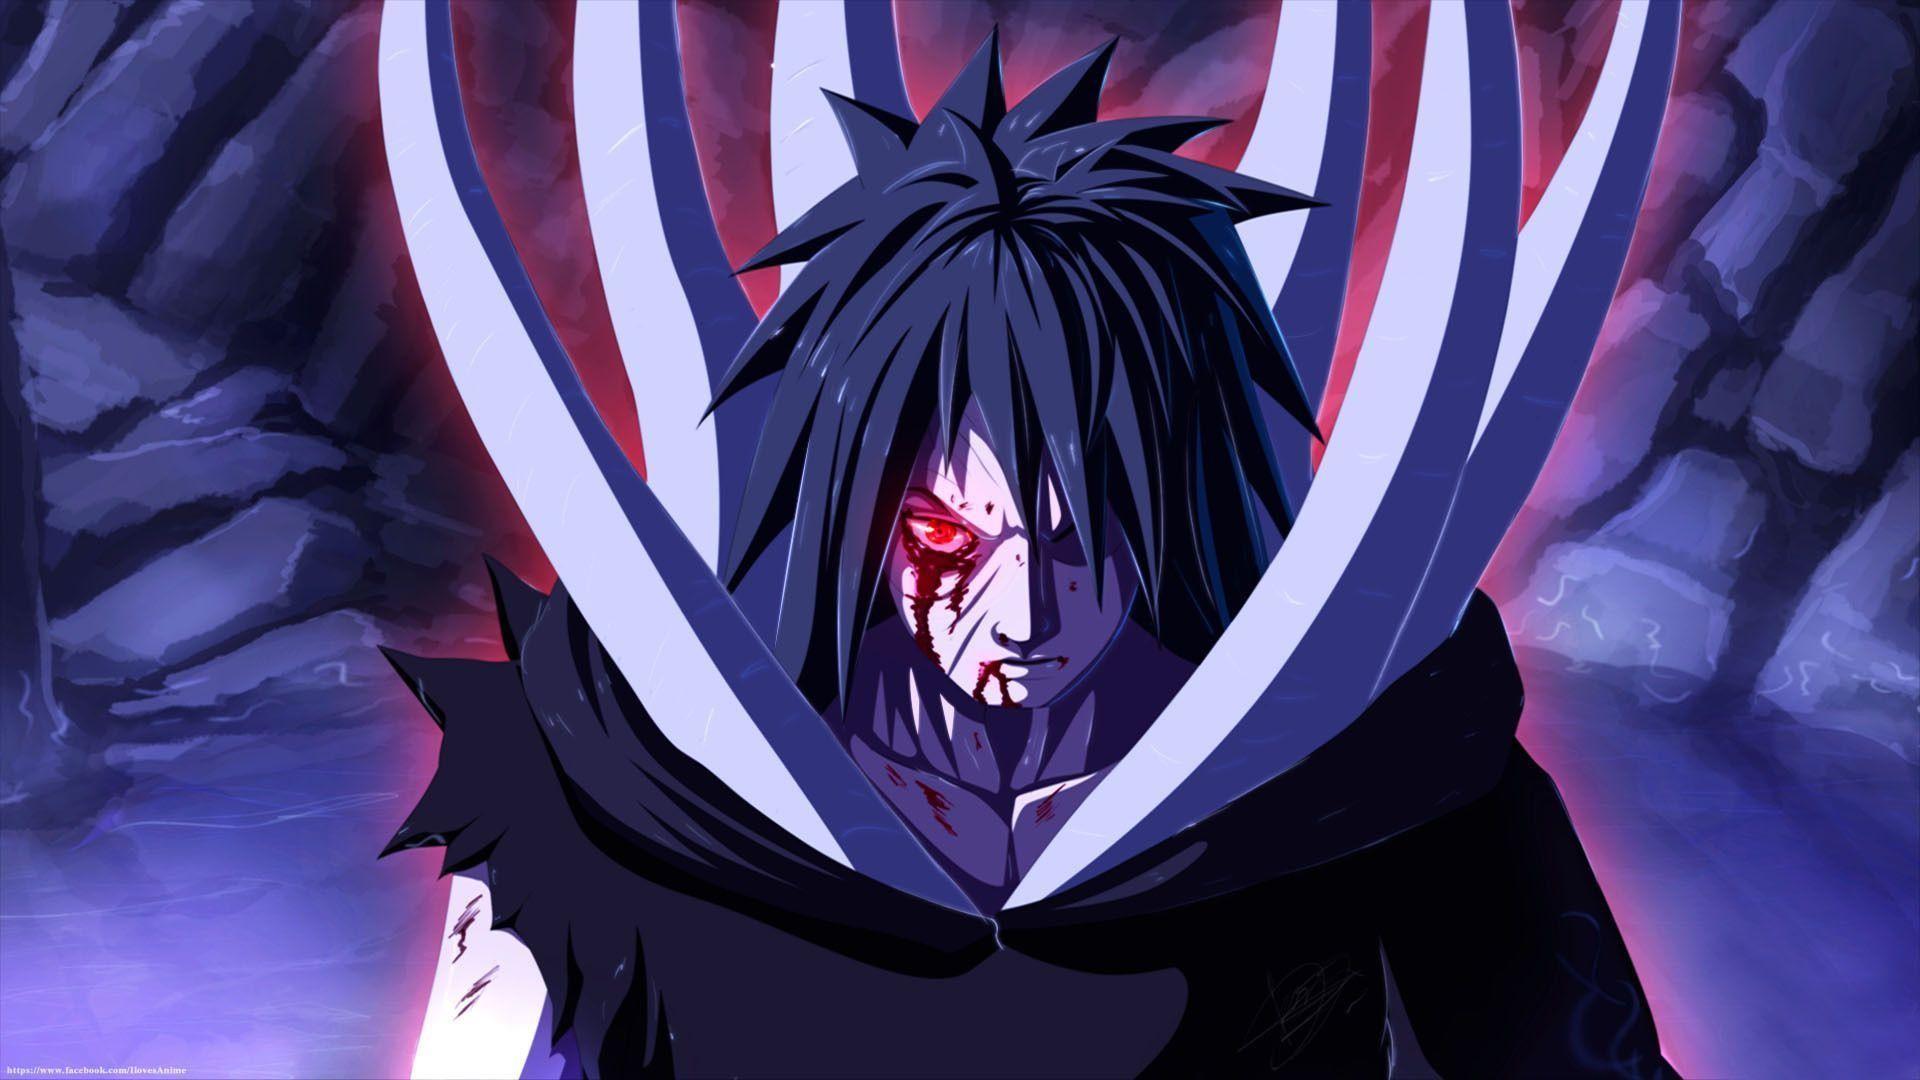 Good Wallpaper Naruto Hood - 178496  Image_14864.jpg